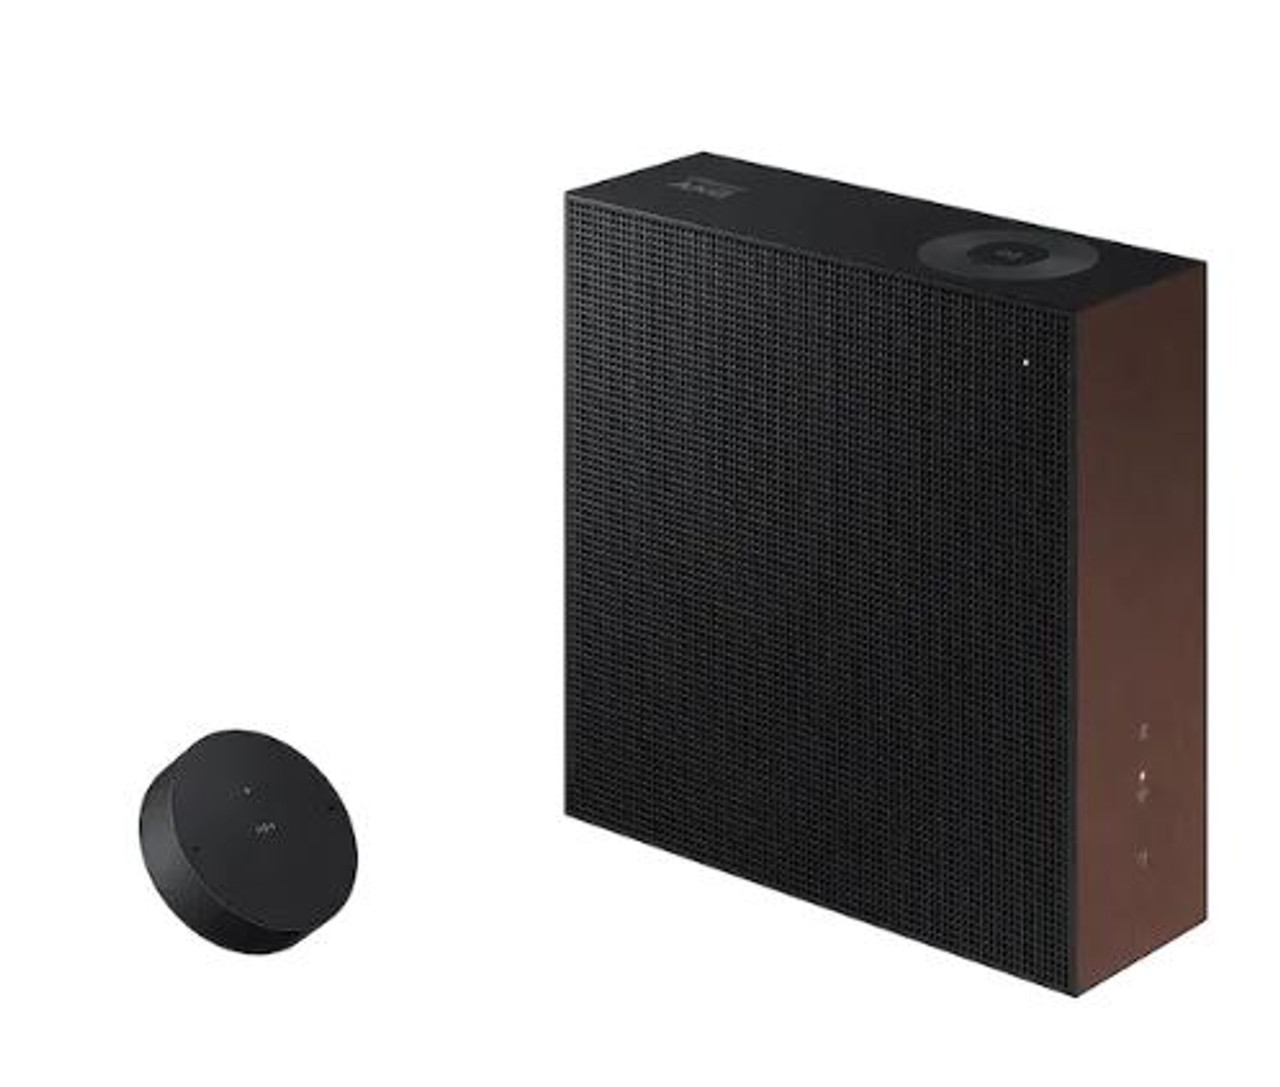 Samsung  VL350/ZAR  Bluetooth Speaker-UHQ 32bit Upscaling Sound- Certified Refurbished